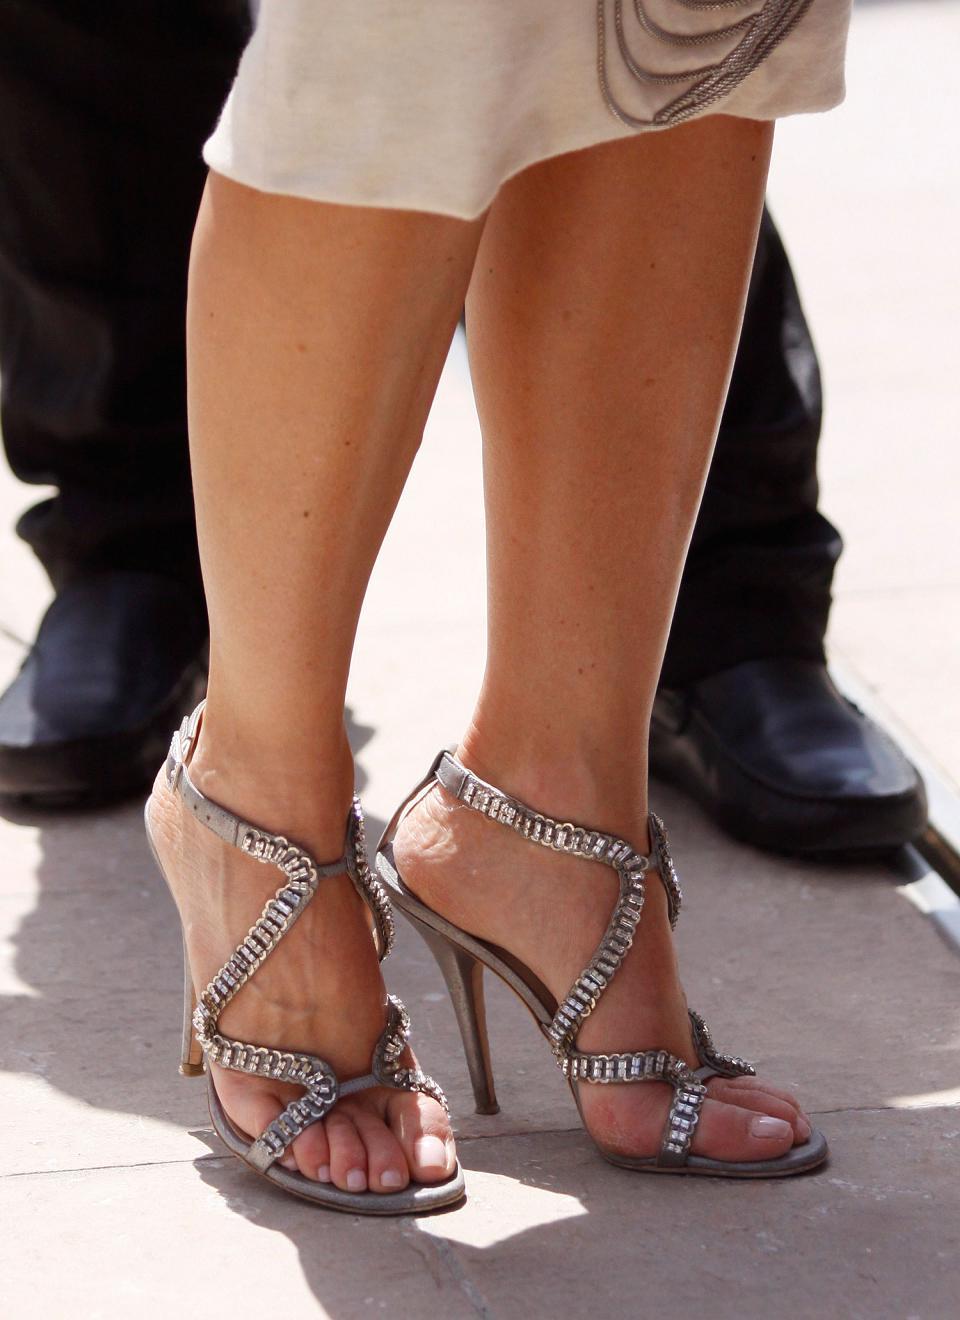 Bigfoot Celebrity: Nelly Furtado Feet